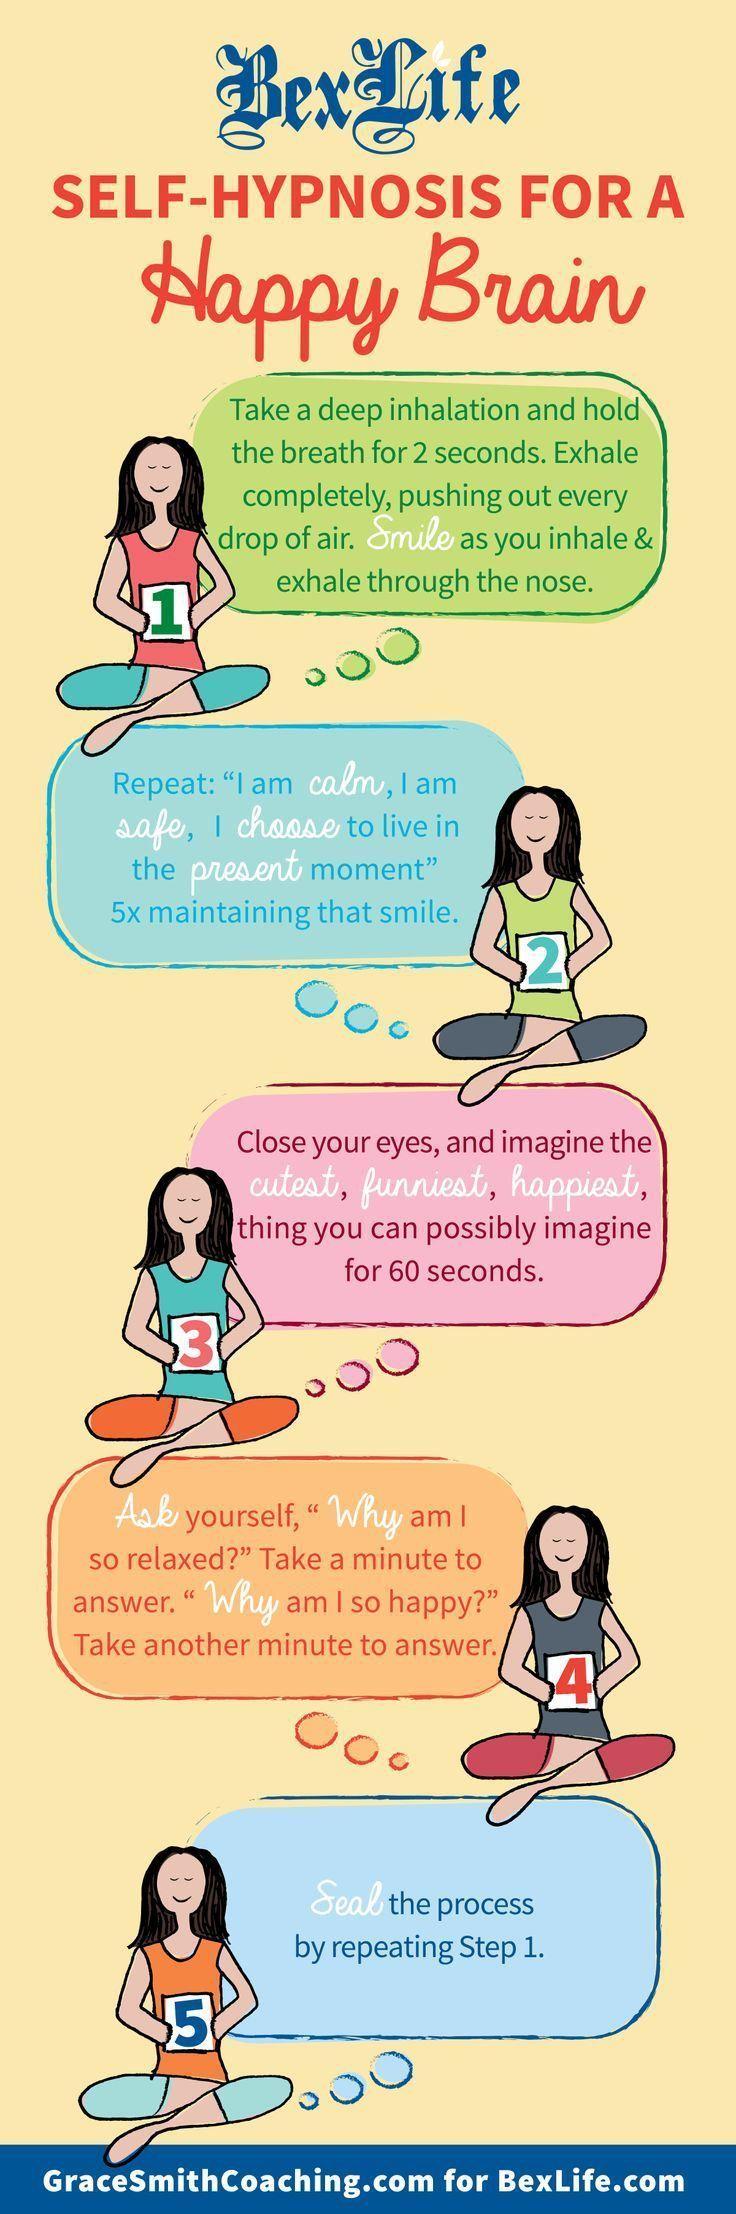 Self Hypnosis for a Happy Brain #NLP - Neuro Linguistic Programming - Maroc Désert Expérience http://www.marocdesertexperience.com?utm_content=buffer27f43&utm_medium=social&utm_source=pinterest.com&utm_campaign=buffer